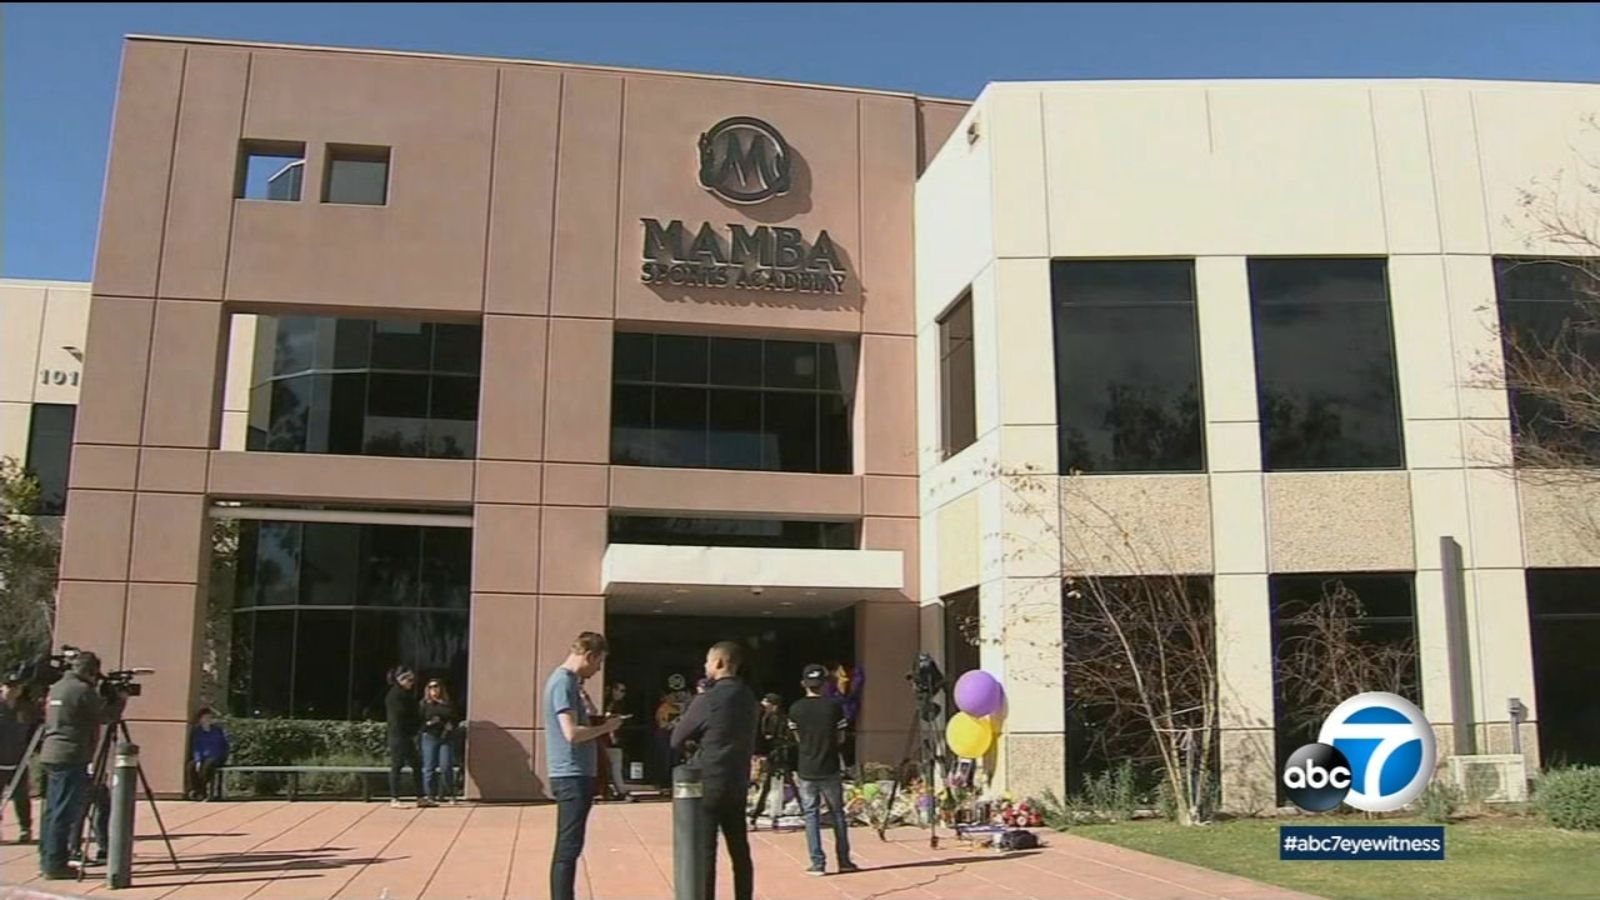 Kobe Bryant fans flock to Mamba Academy in Thousand Oaks